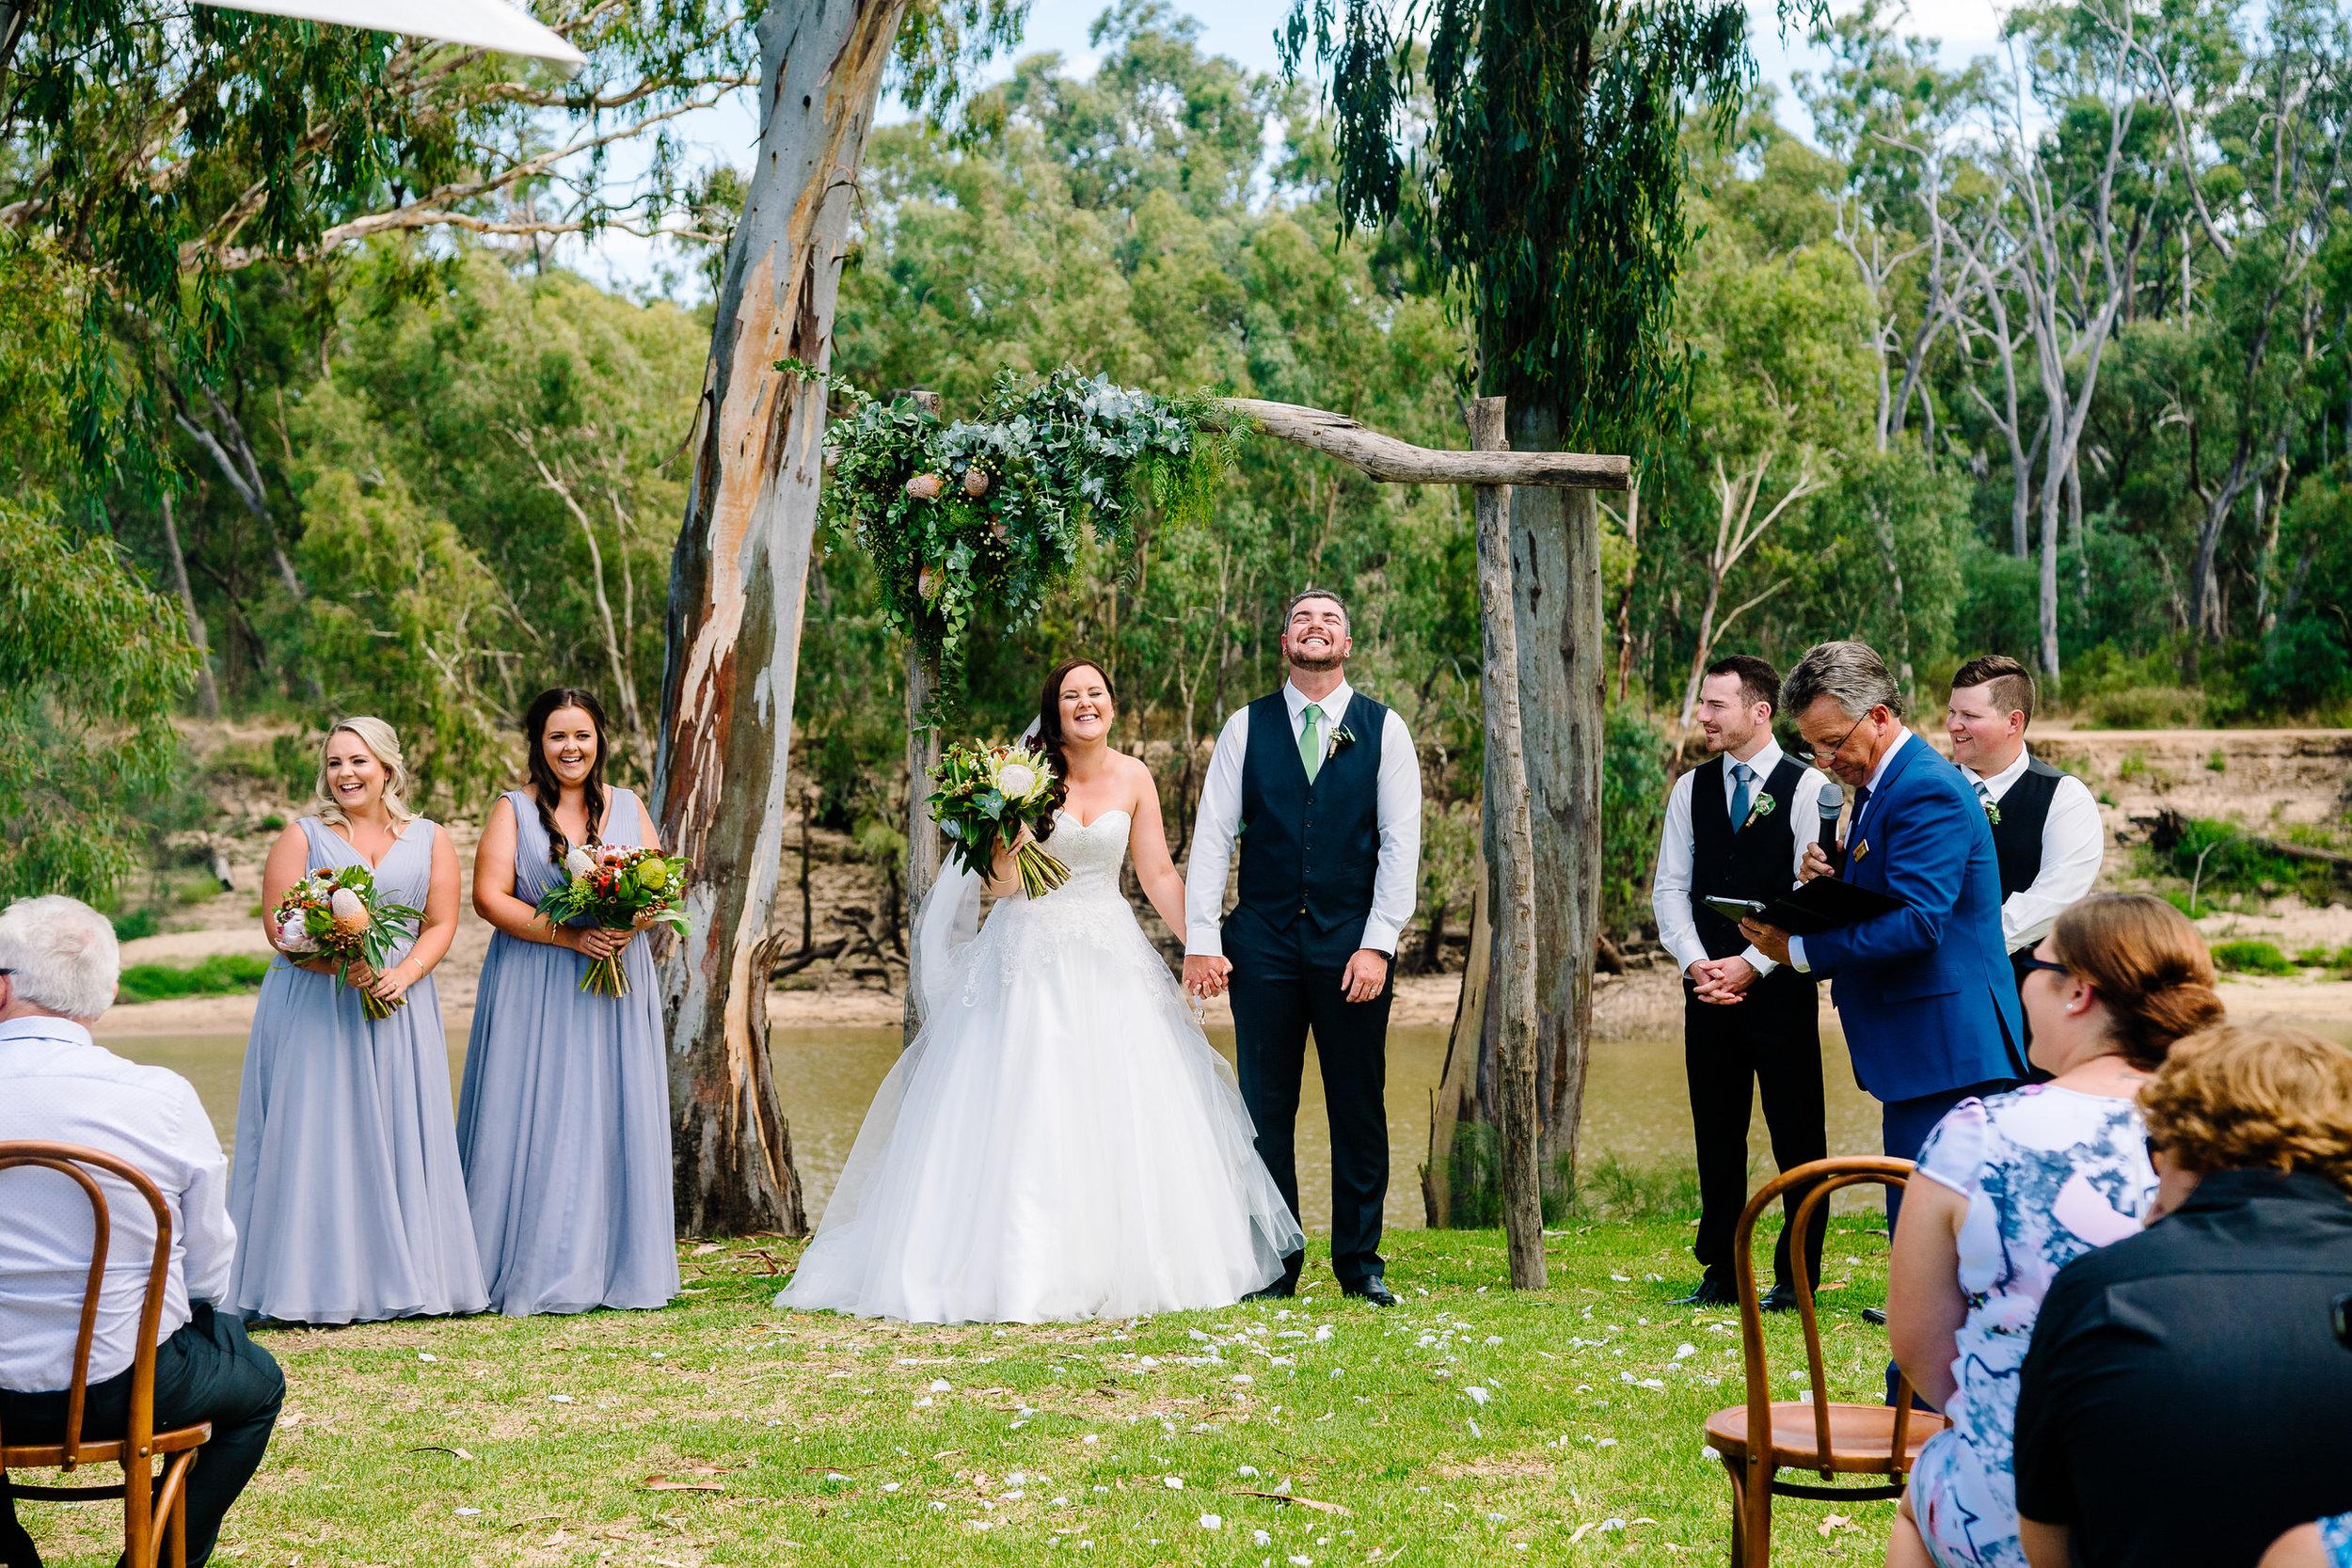 Justin_Jim_Echuca_Wedding_Photography_Tindarra-173.JPG